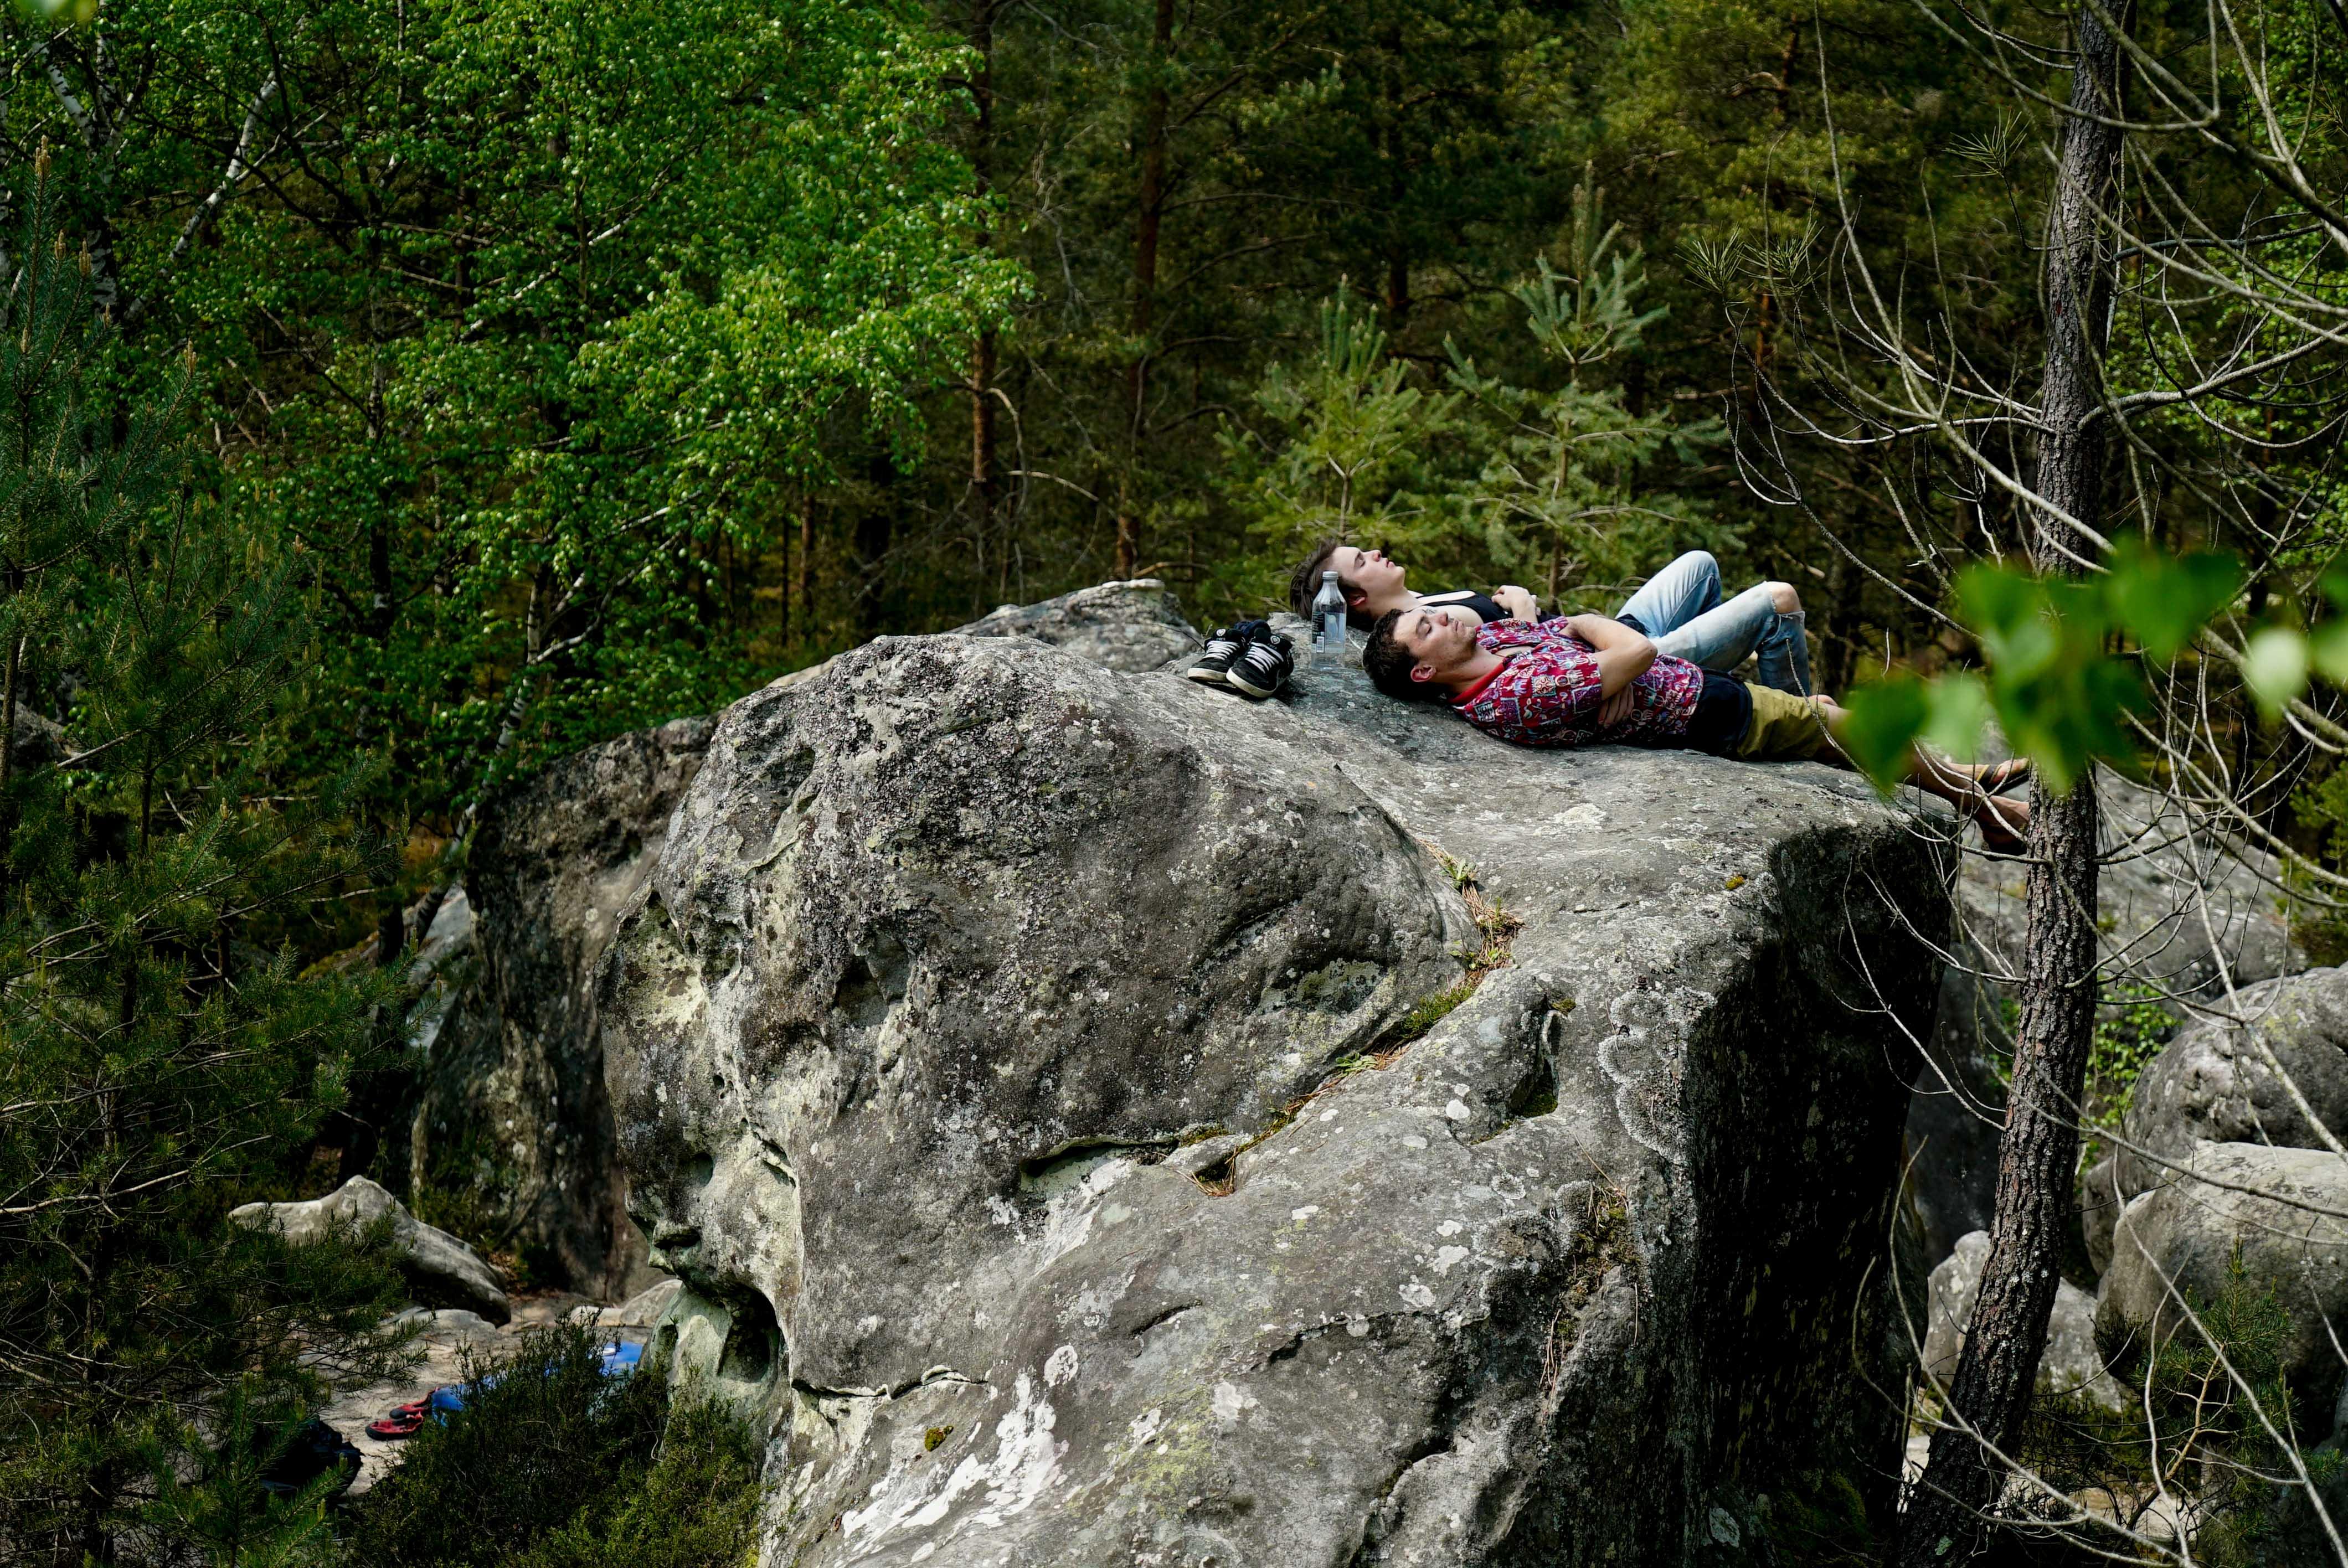 fontainbleau climbing 2016 mike brindley-77